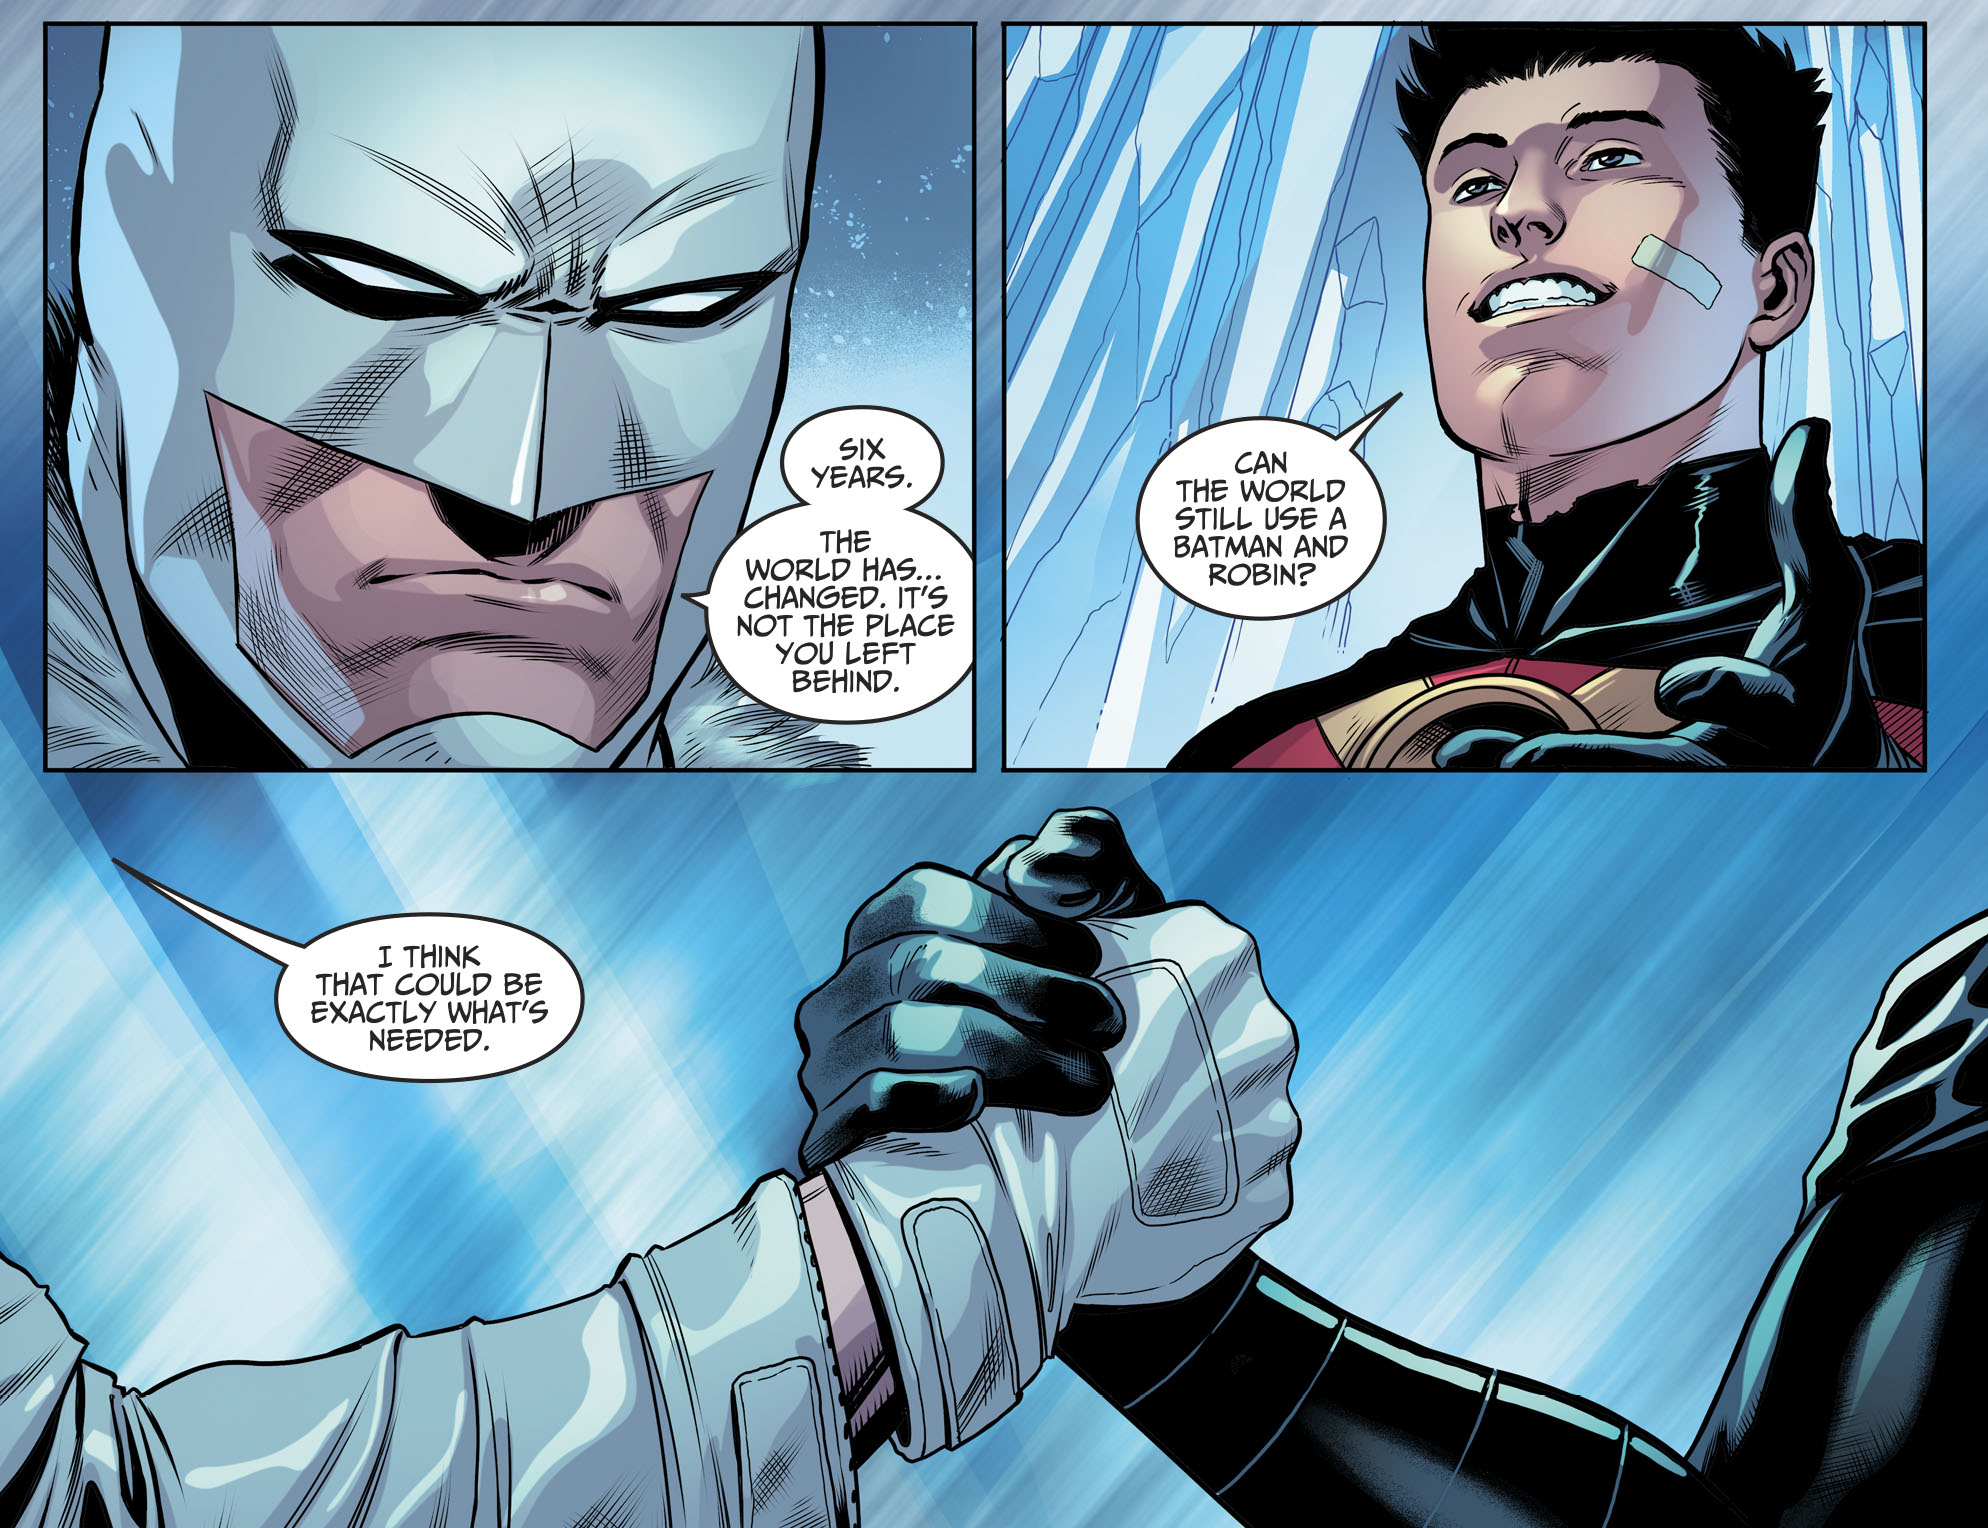 Batman And Red Robin Reunites (Injustice II)